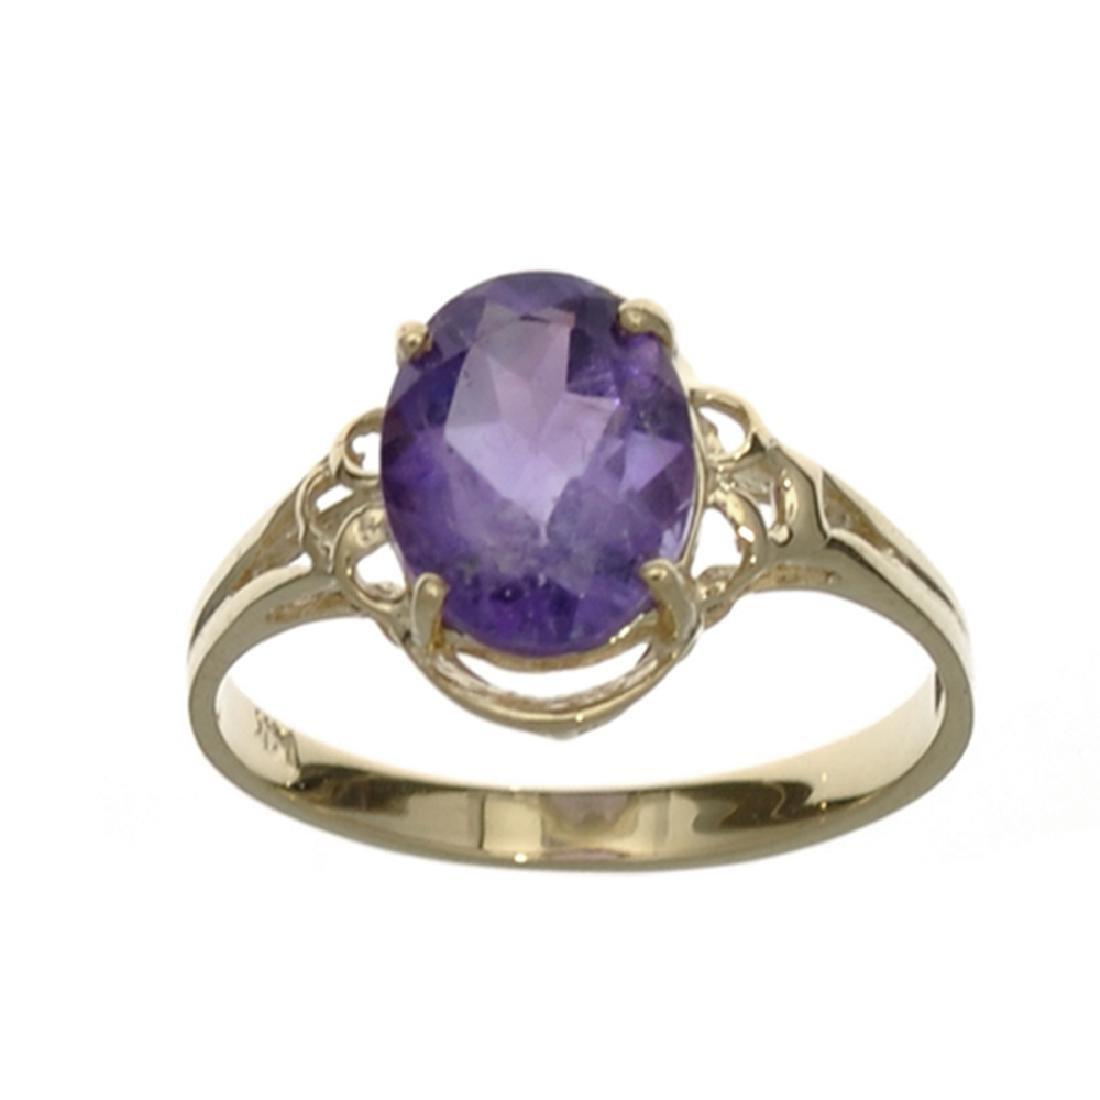 APP: 0.6k Fine Jewelry 14KT Gold, 1.76CT Oval Cut